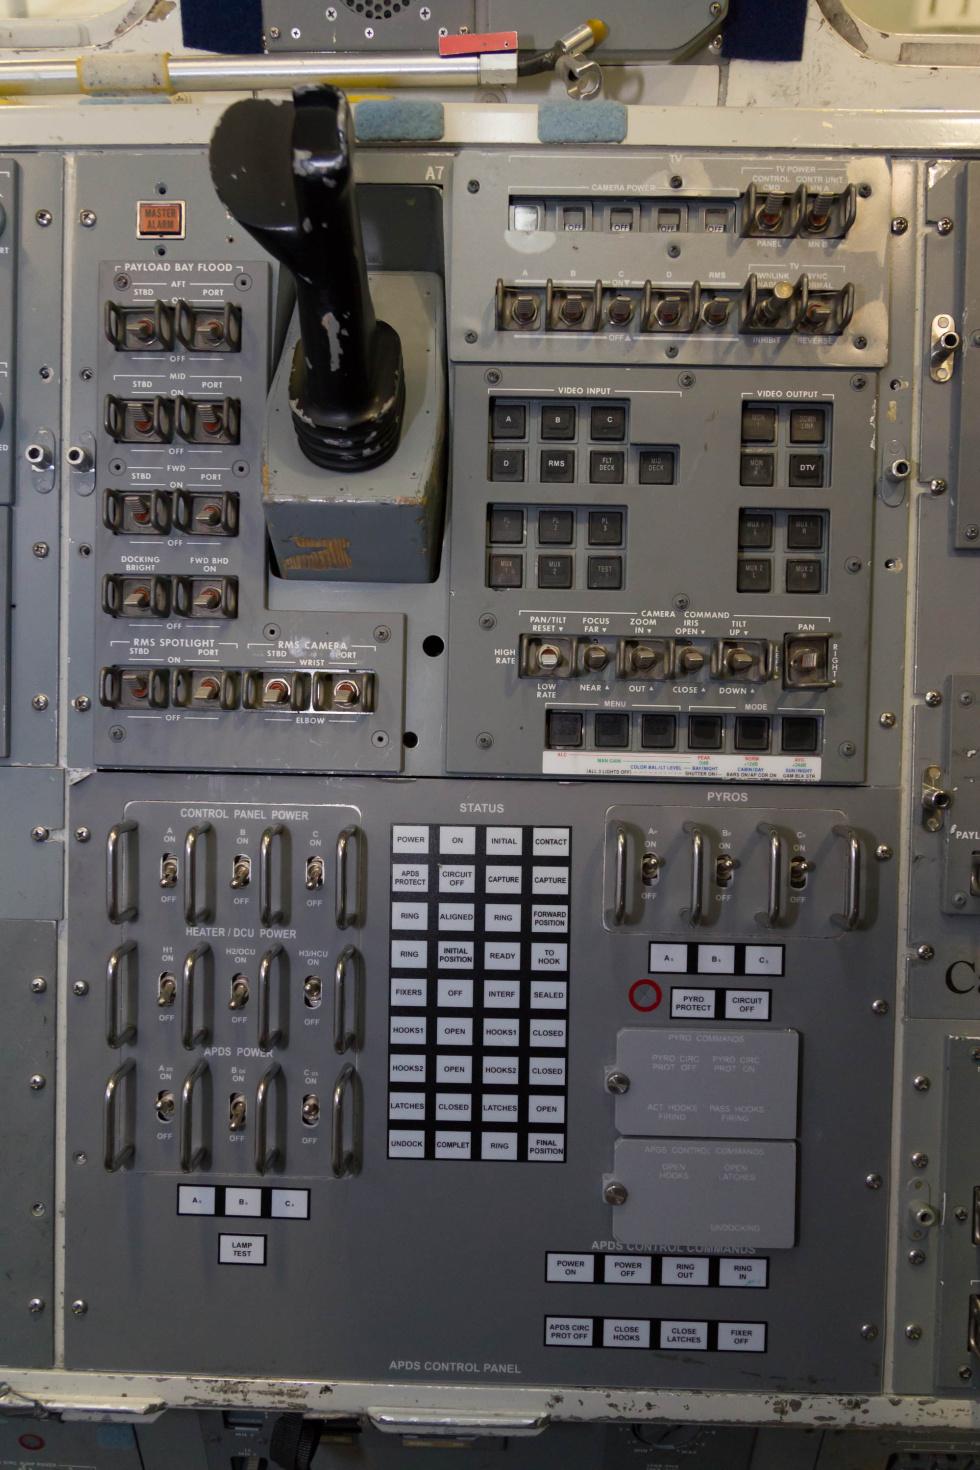 space shuttle cockpit trainer - photo #37